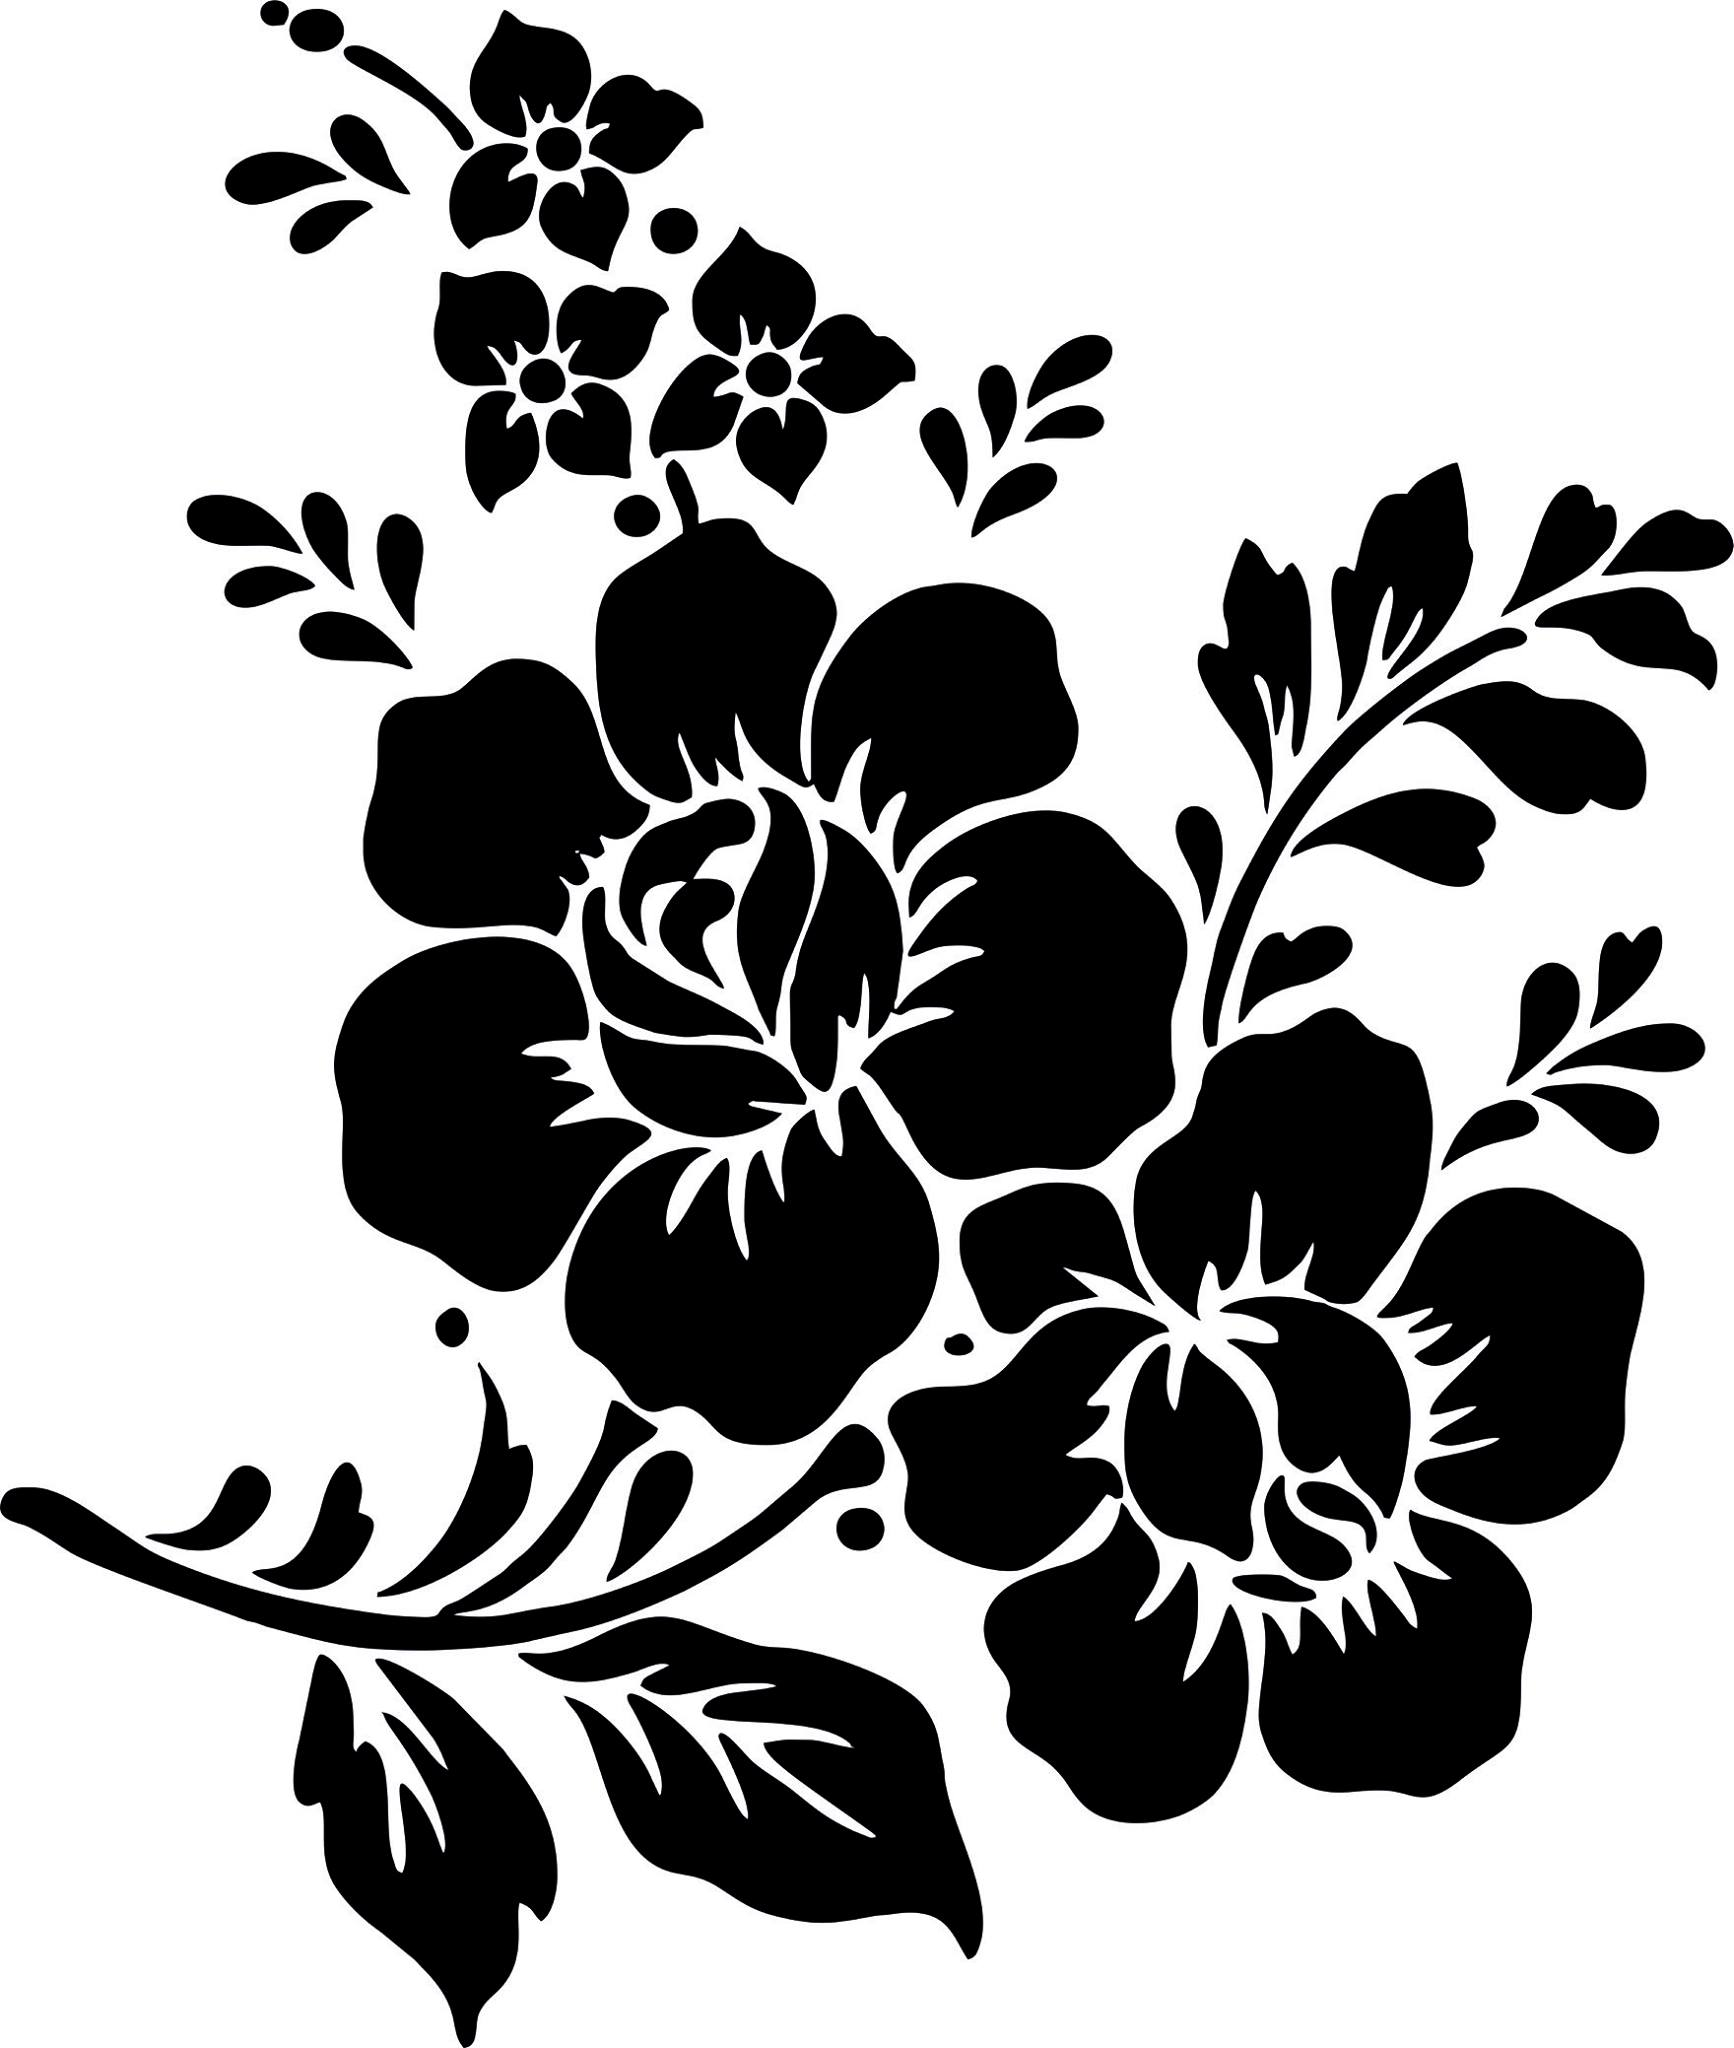 Rose Flower Vector Vector Art jpg Image Free Download